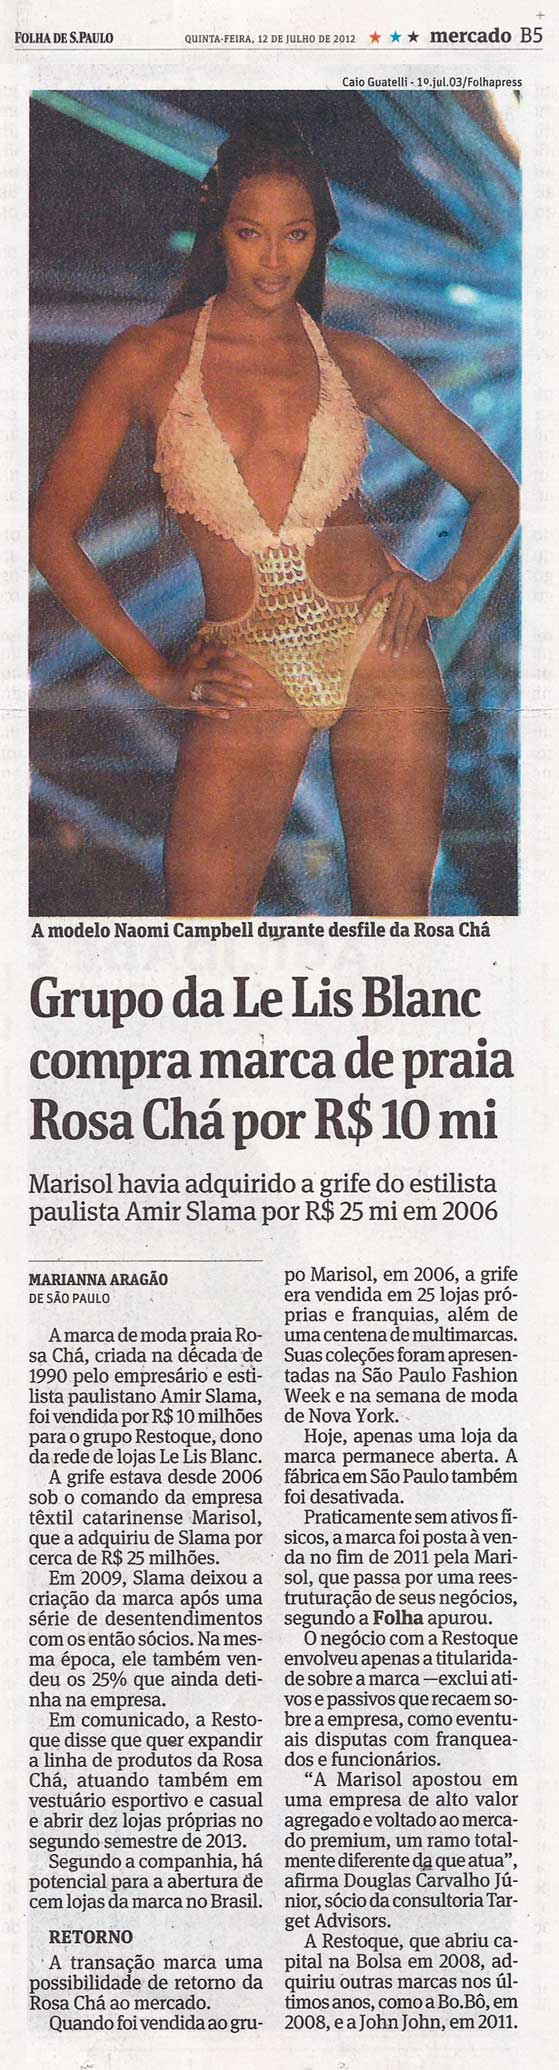 folha-de-sao-paulo-12-07-2012-target-advisor